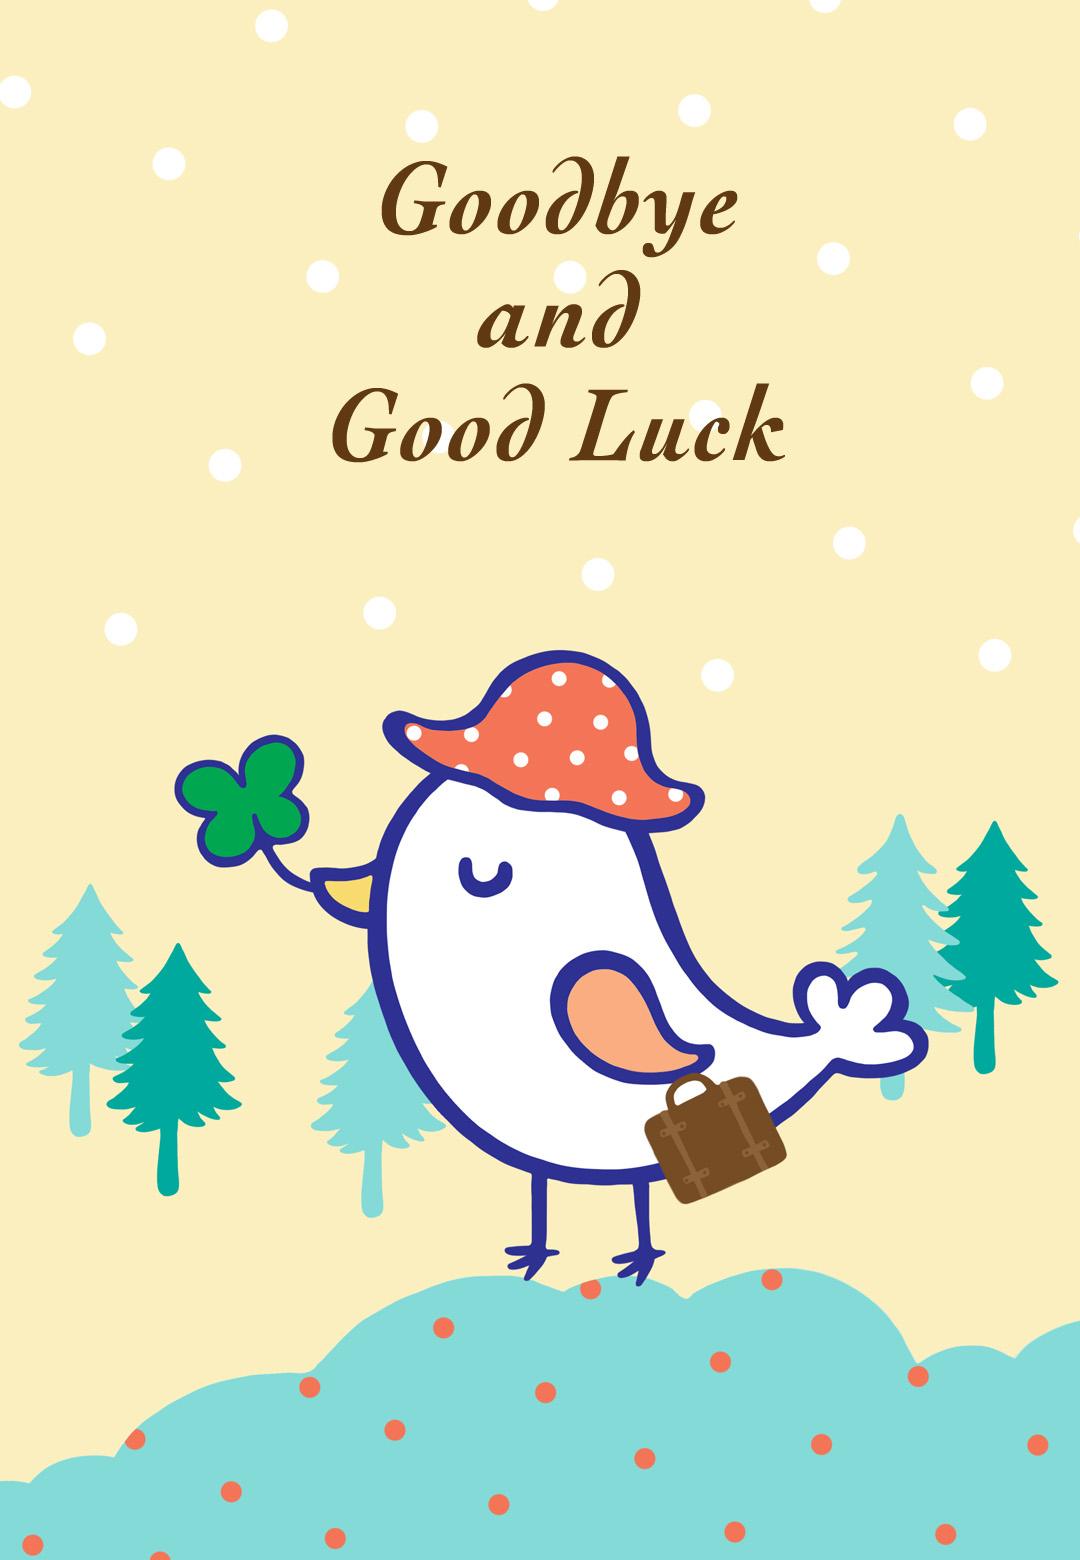 Staff clipart farewell Goodbye Printable Luck Card Luck